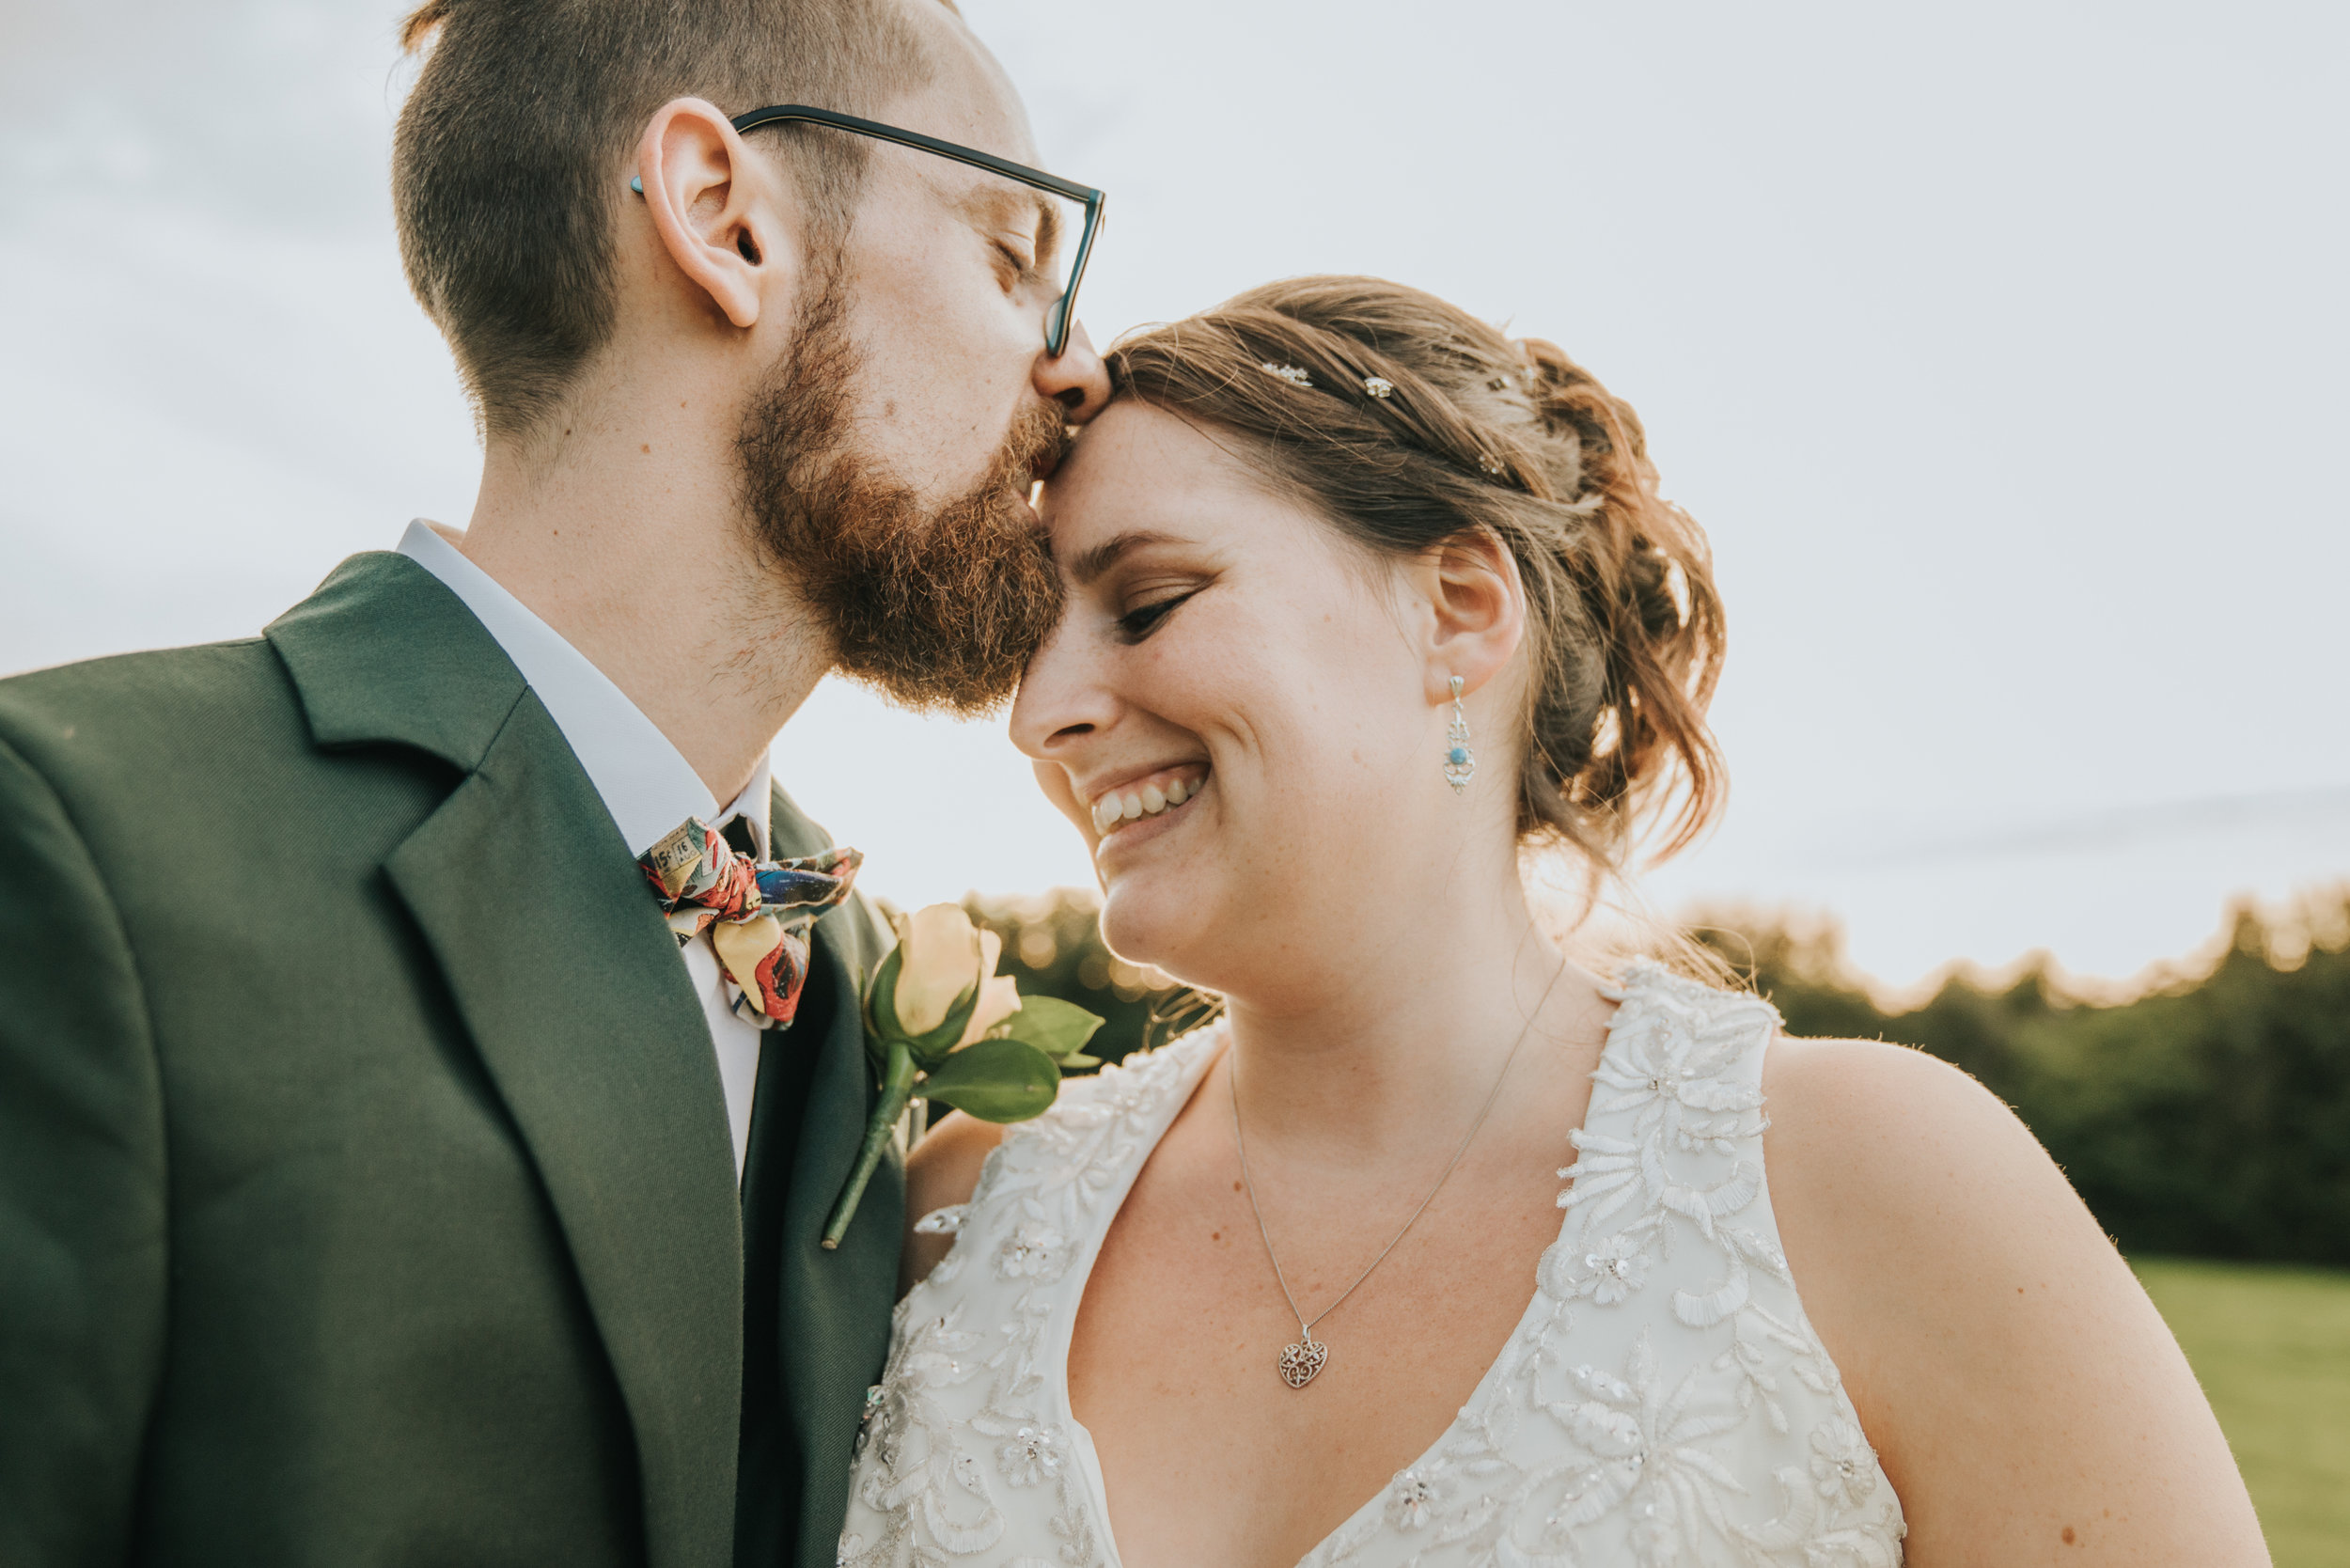 Wedding+2017+-+2018+(21+of+30).jpg